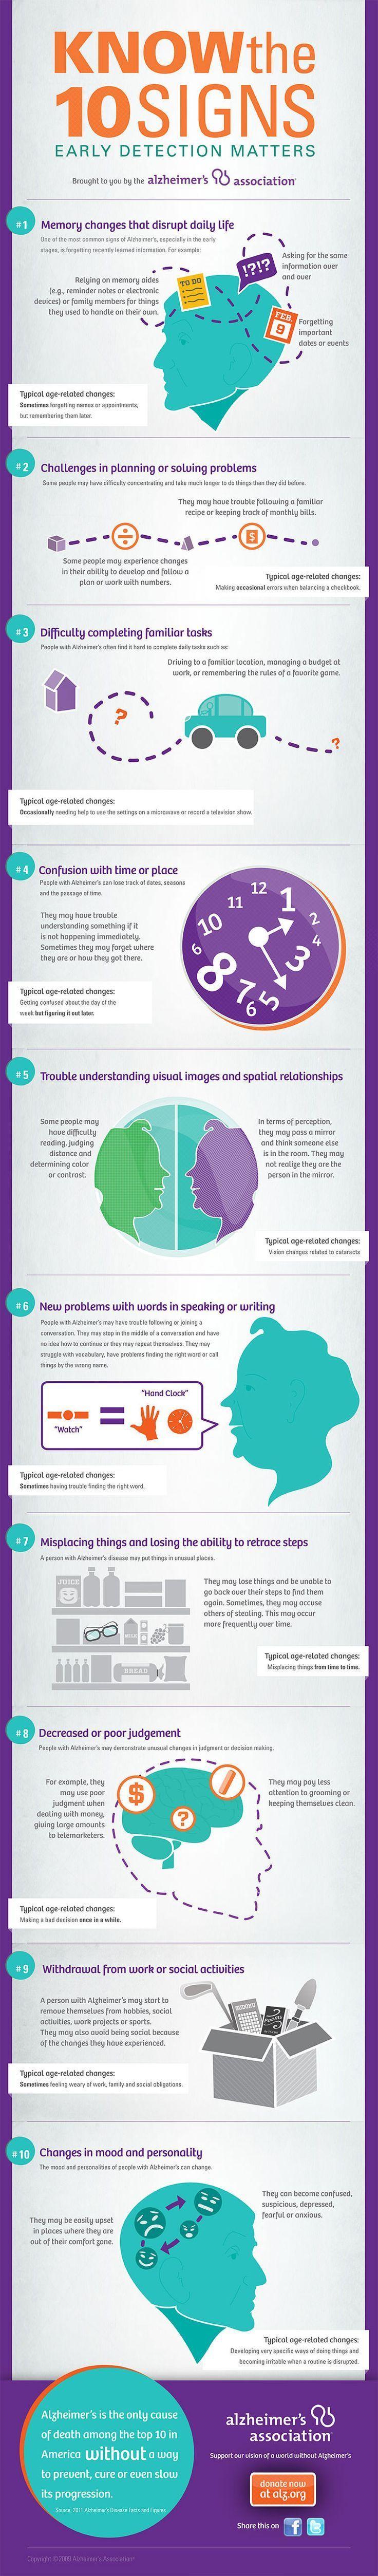 5 Ways CBD Can Help With Alzheimer's